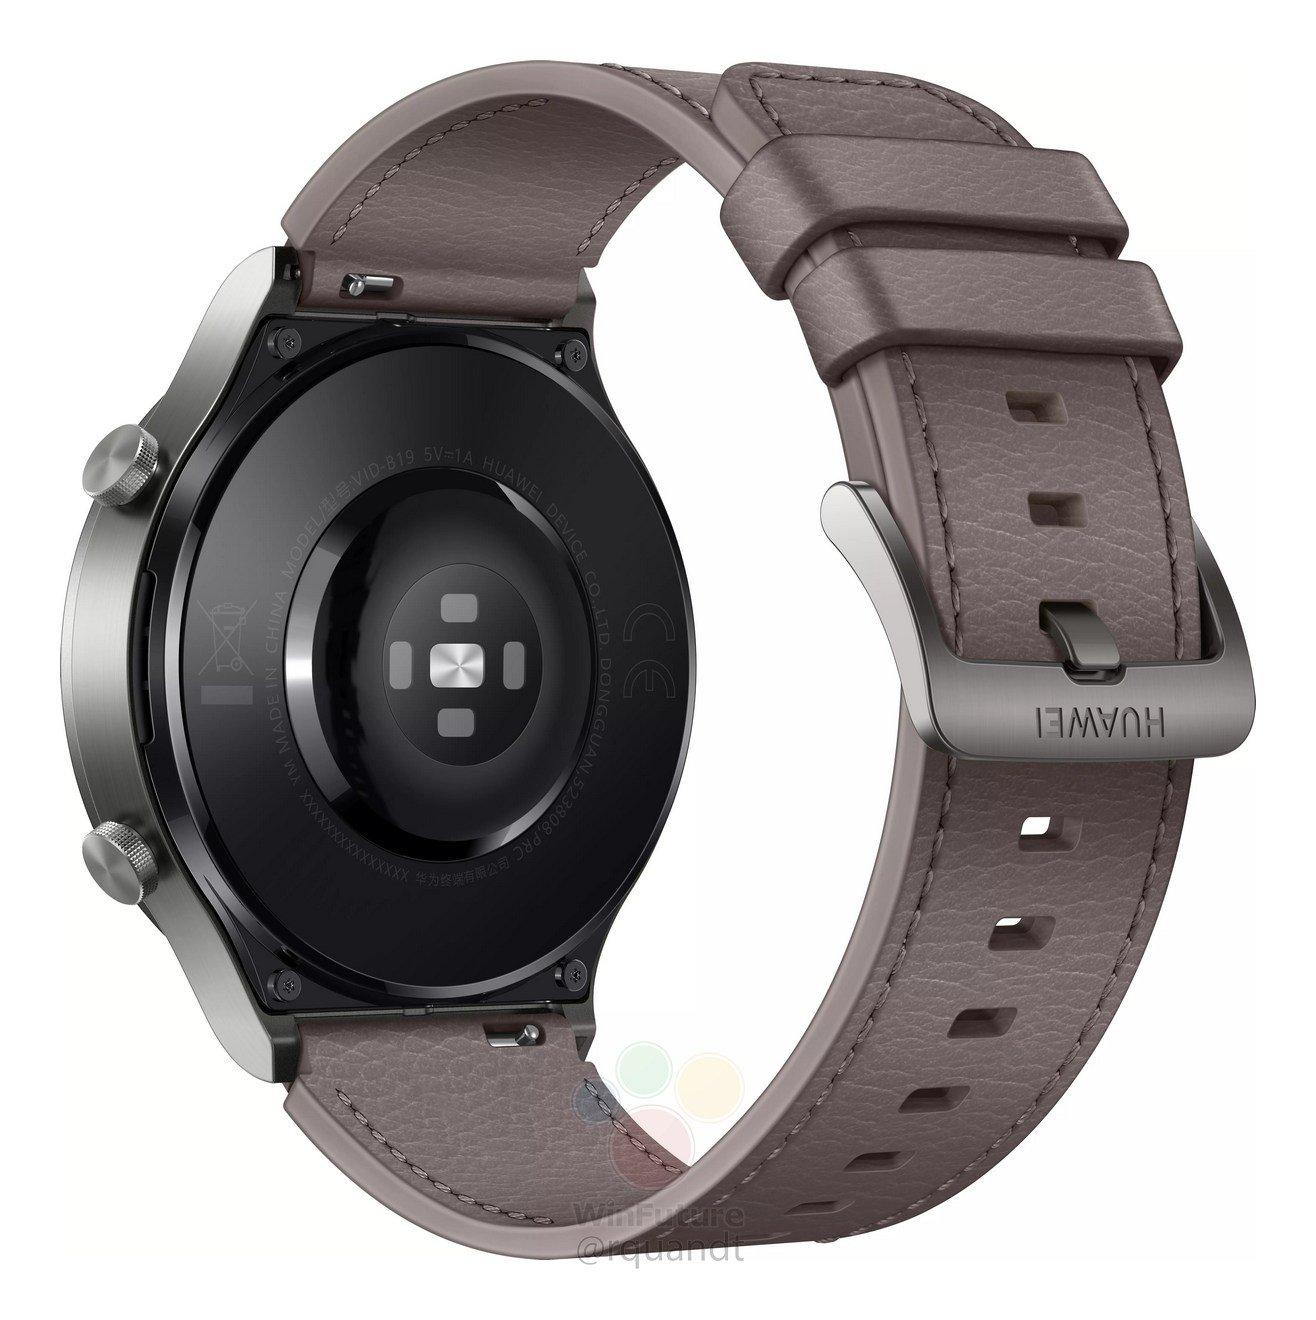 Huawei Watch GT2 Pro 1599138629 0 0 (1) large